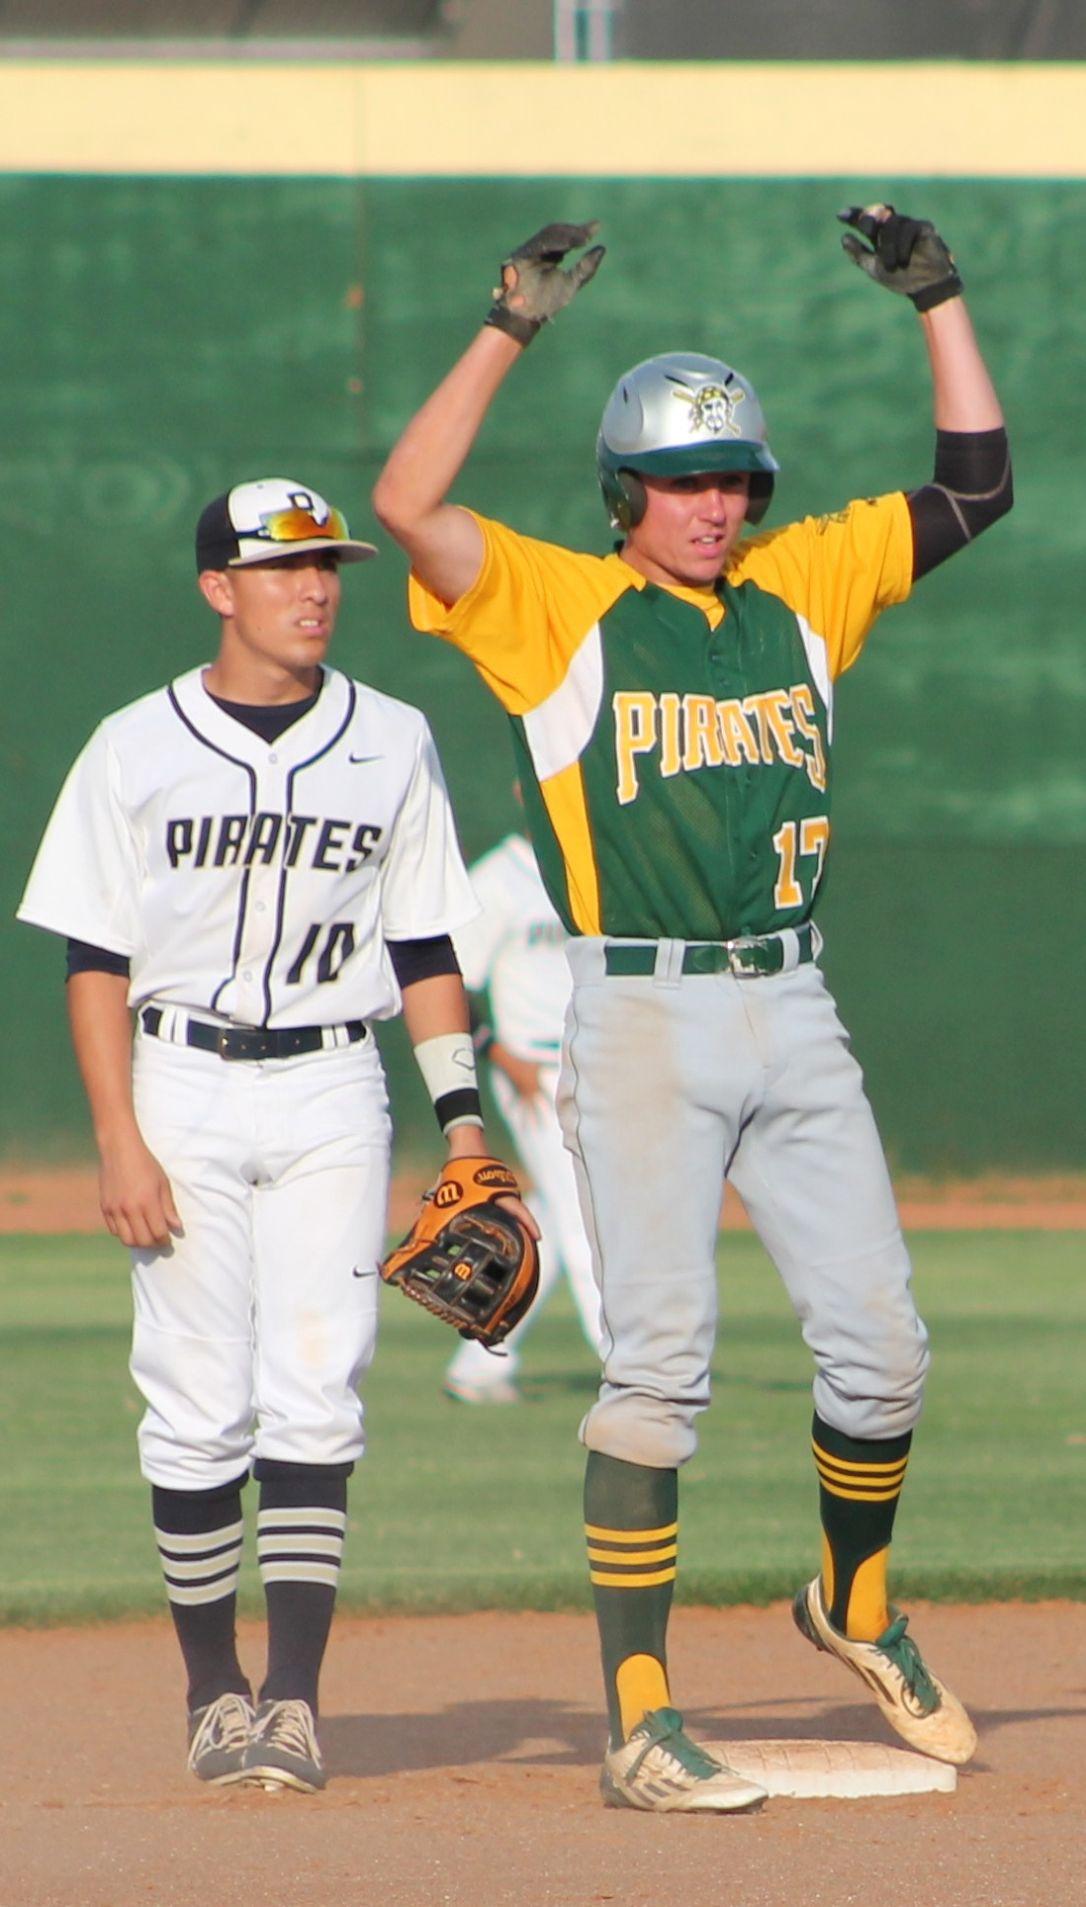 2015 Pirate Baseball Playoffs at Laradeo_01.jpg